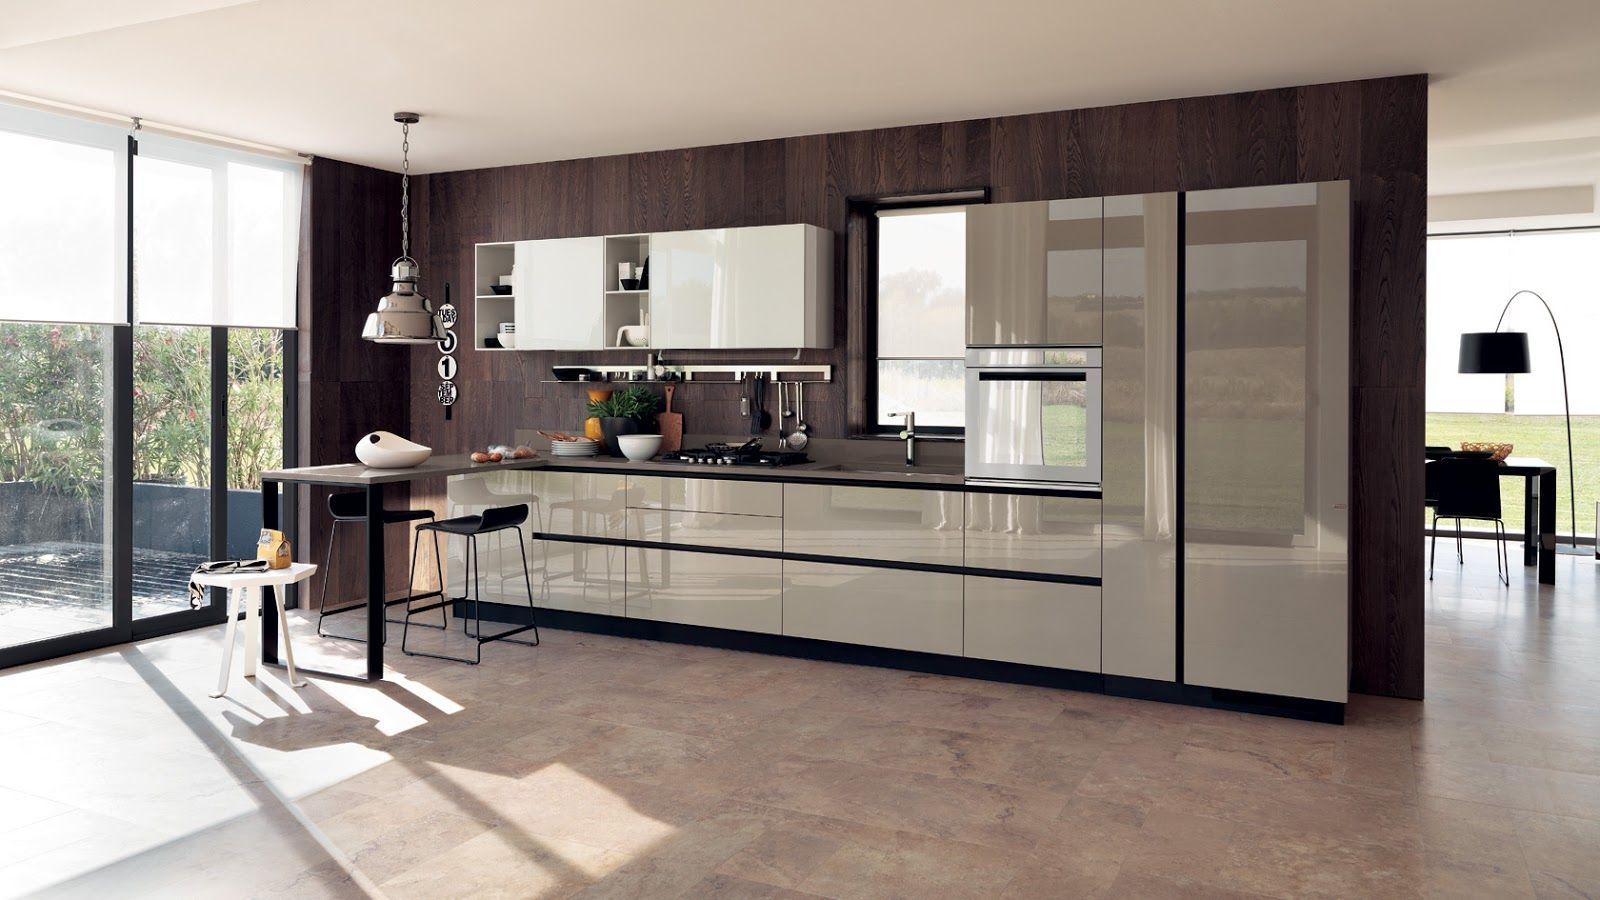 diseño de cocina moderna   Daniel   Pinterest   Kitchens and Modern